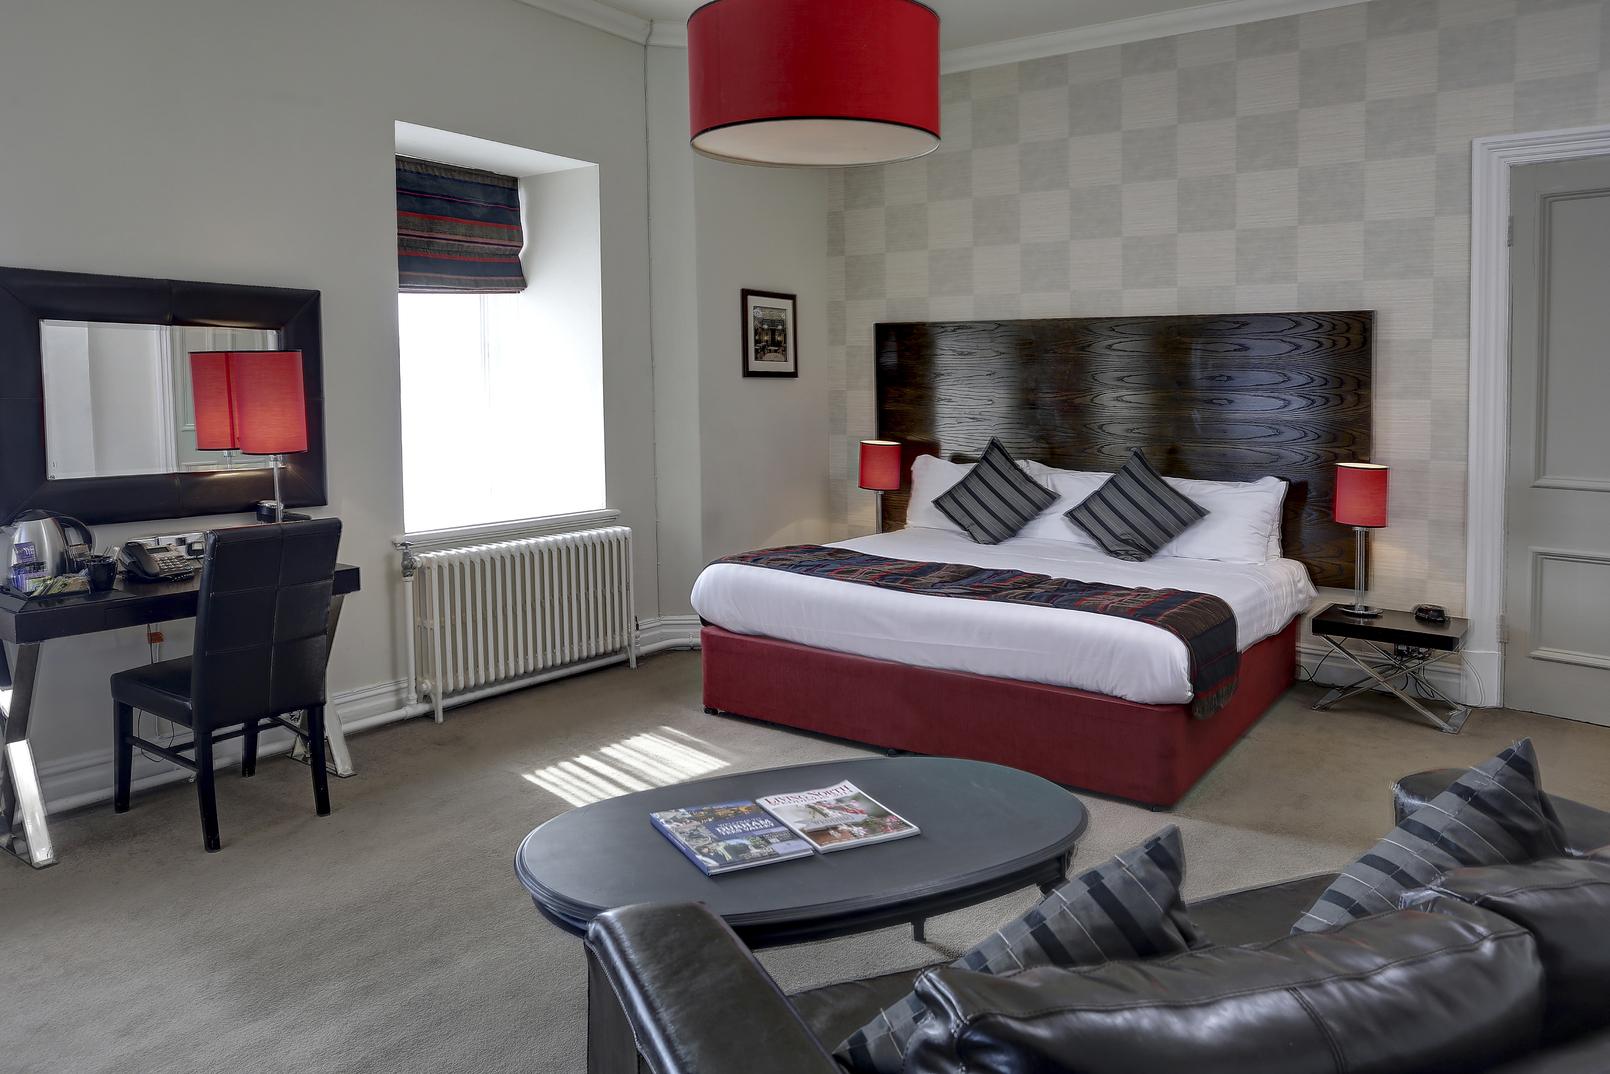 Grand Hotel Rooms Hartlepool